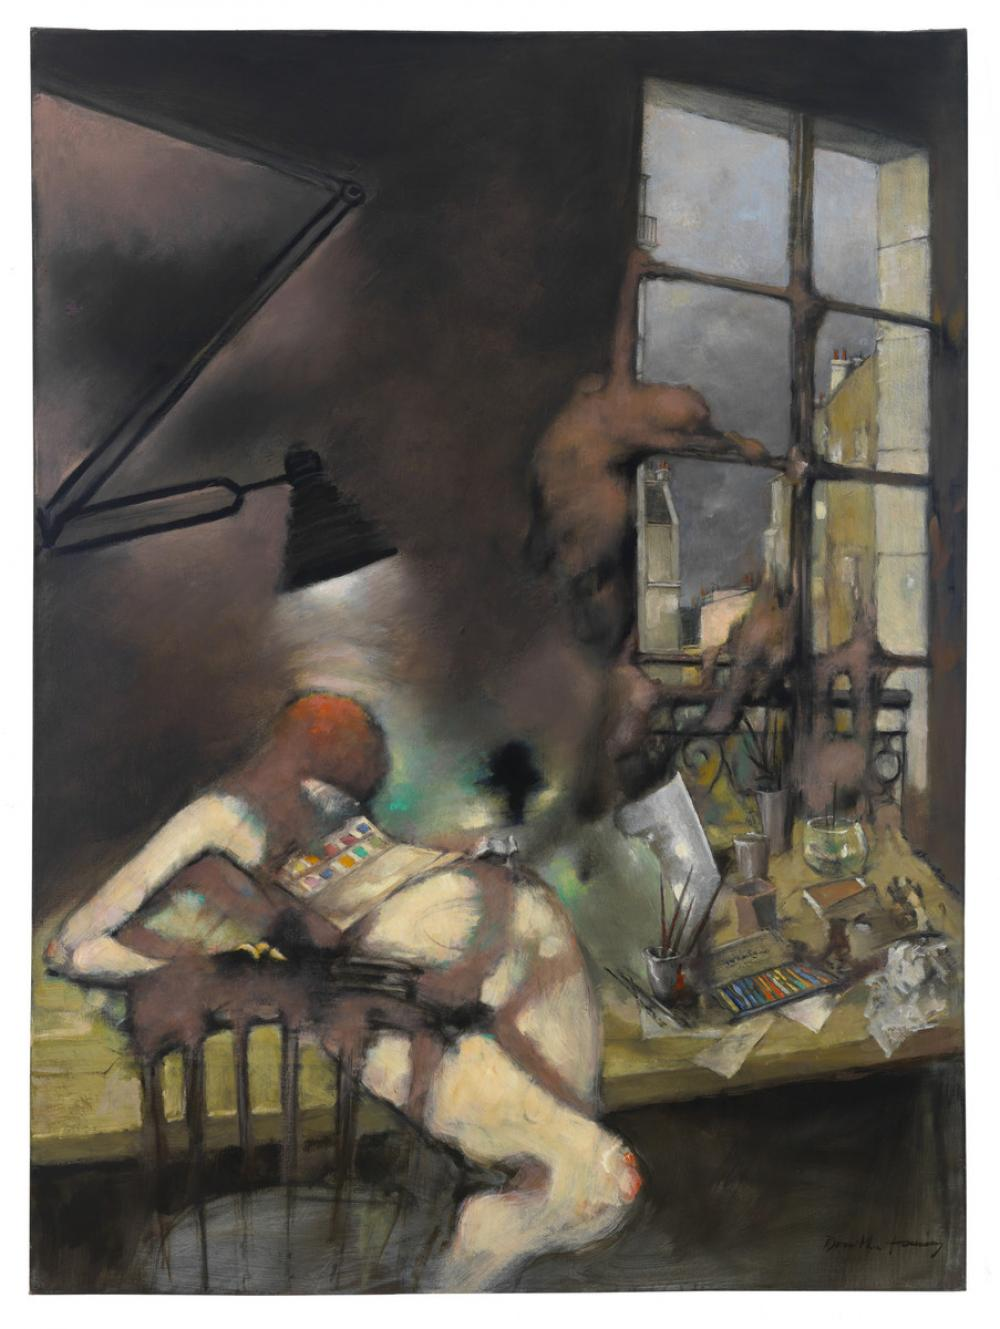 Tanning, Dorothea, Still in the Studio